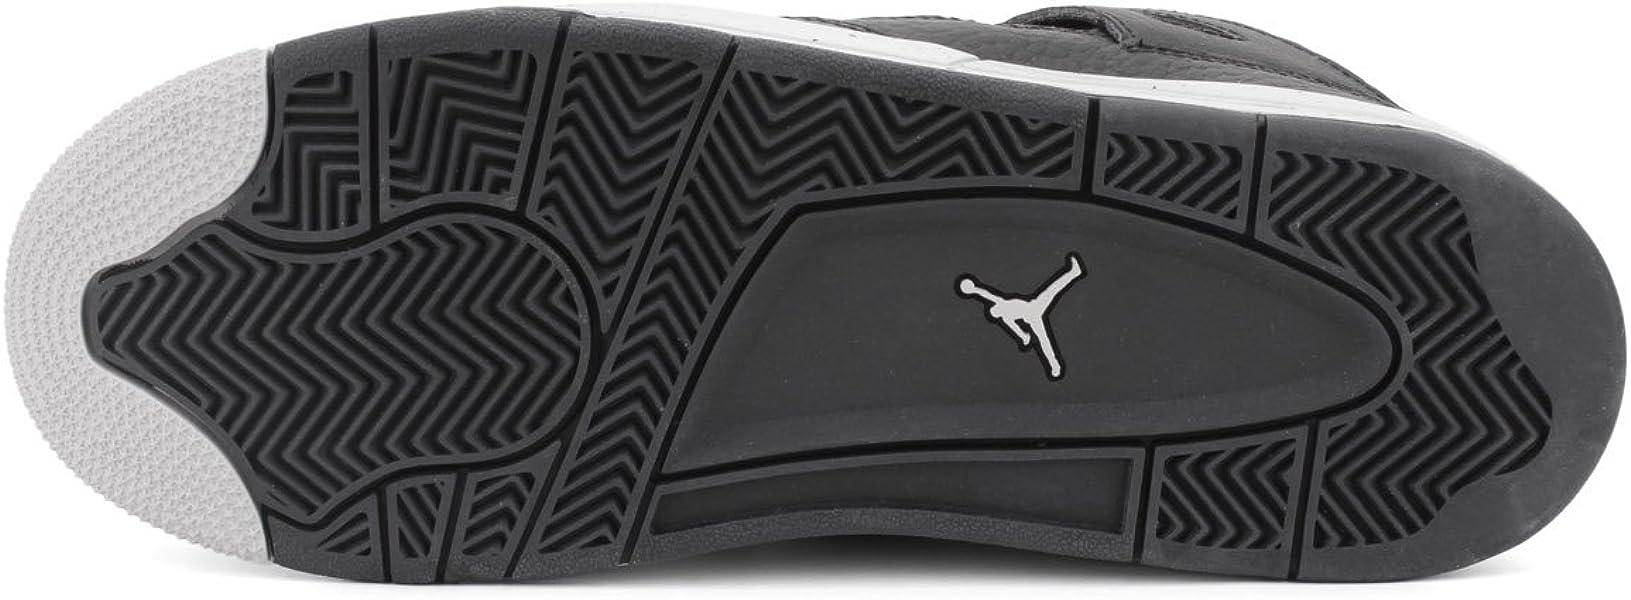 4d913c159298b6 Air Jordan 4 Retro BG - 408452 003. Back. Double-tap to zoom